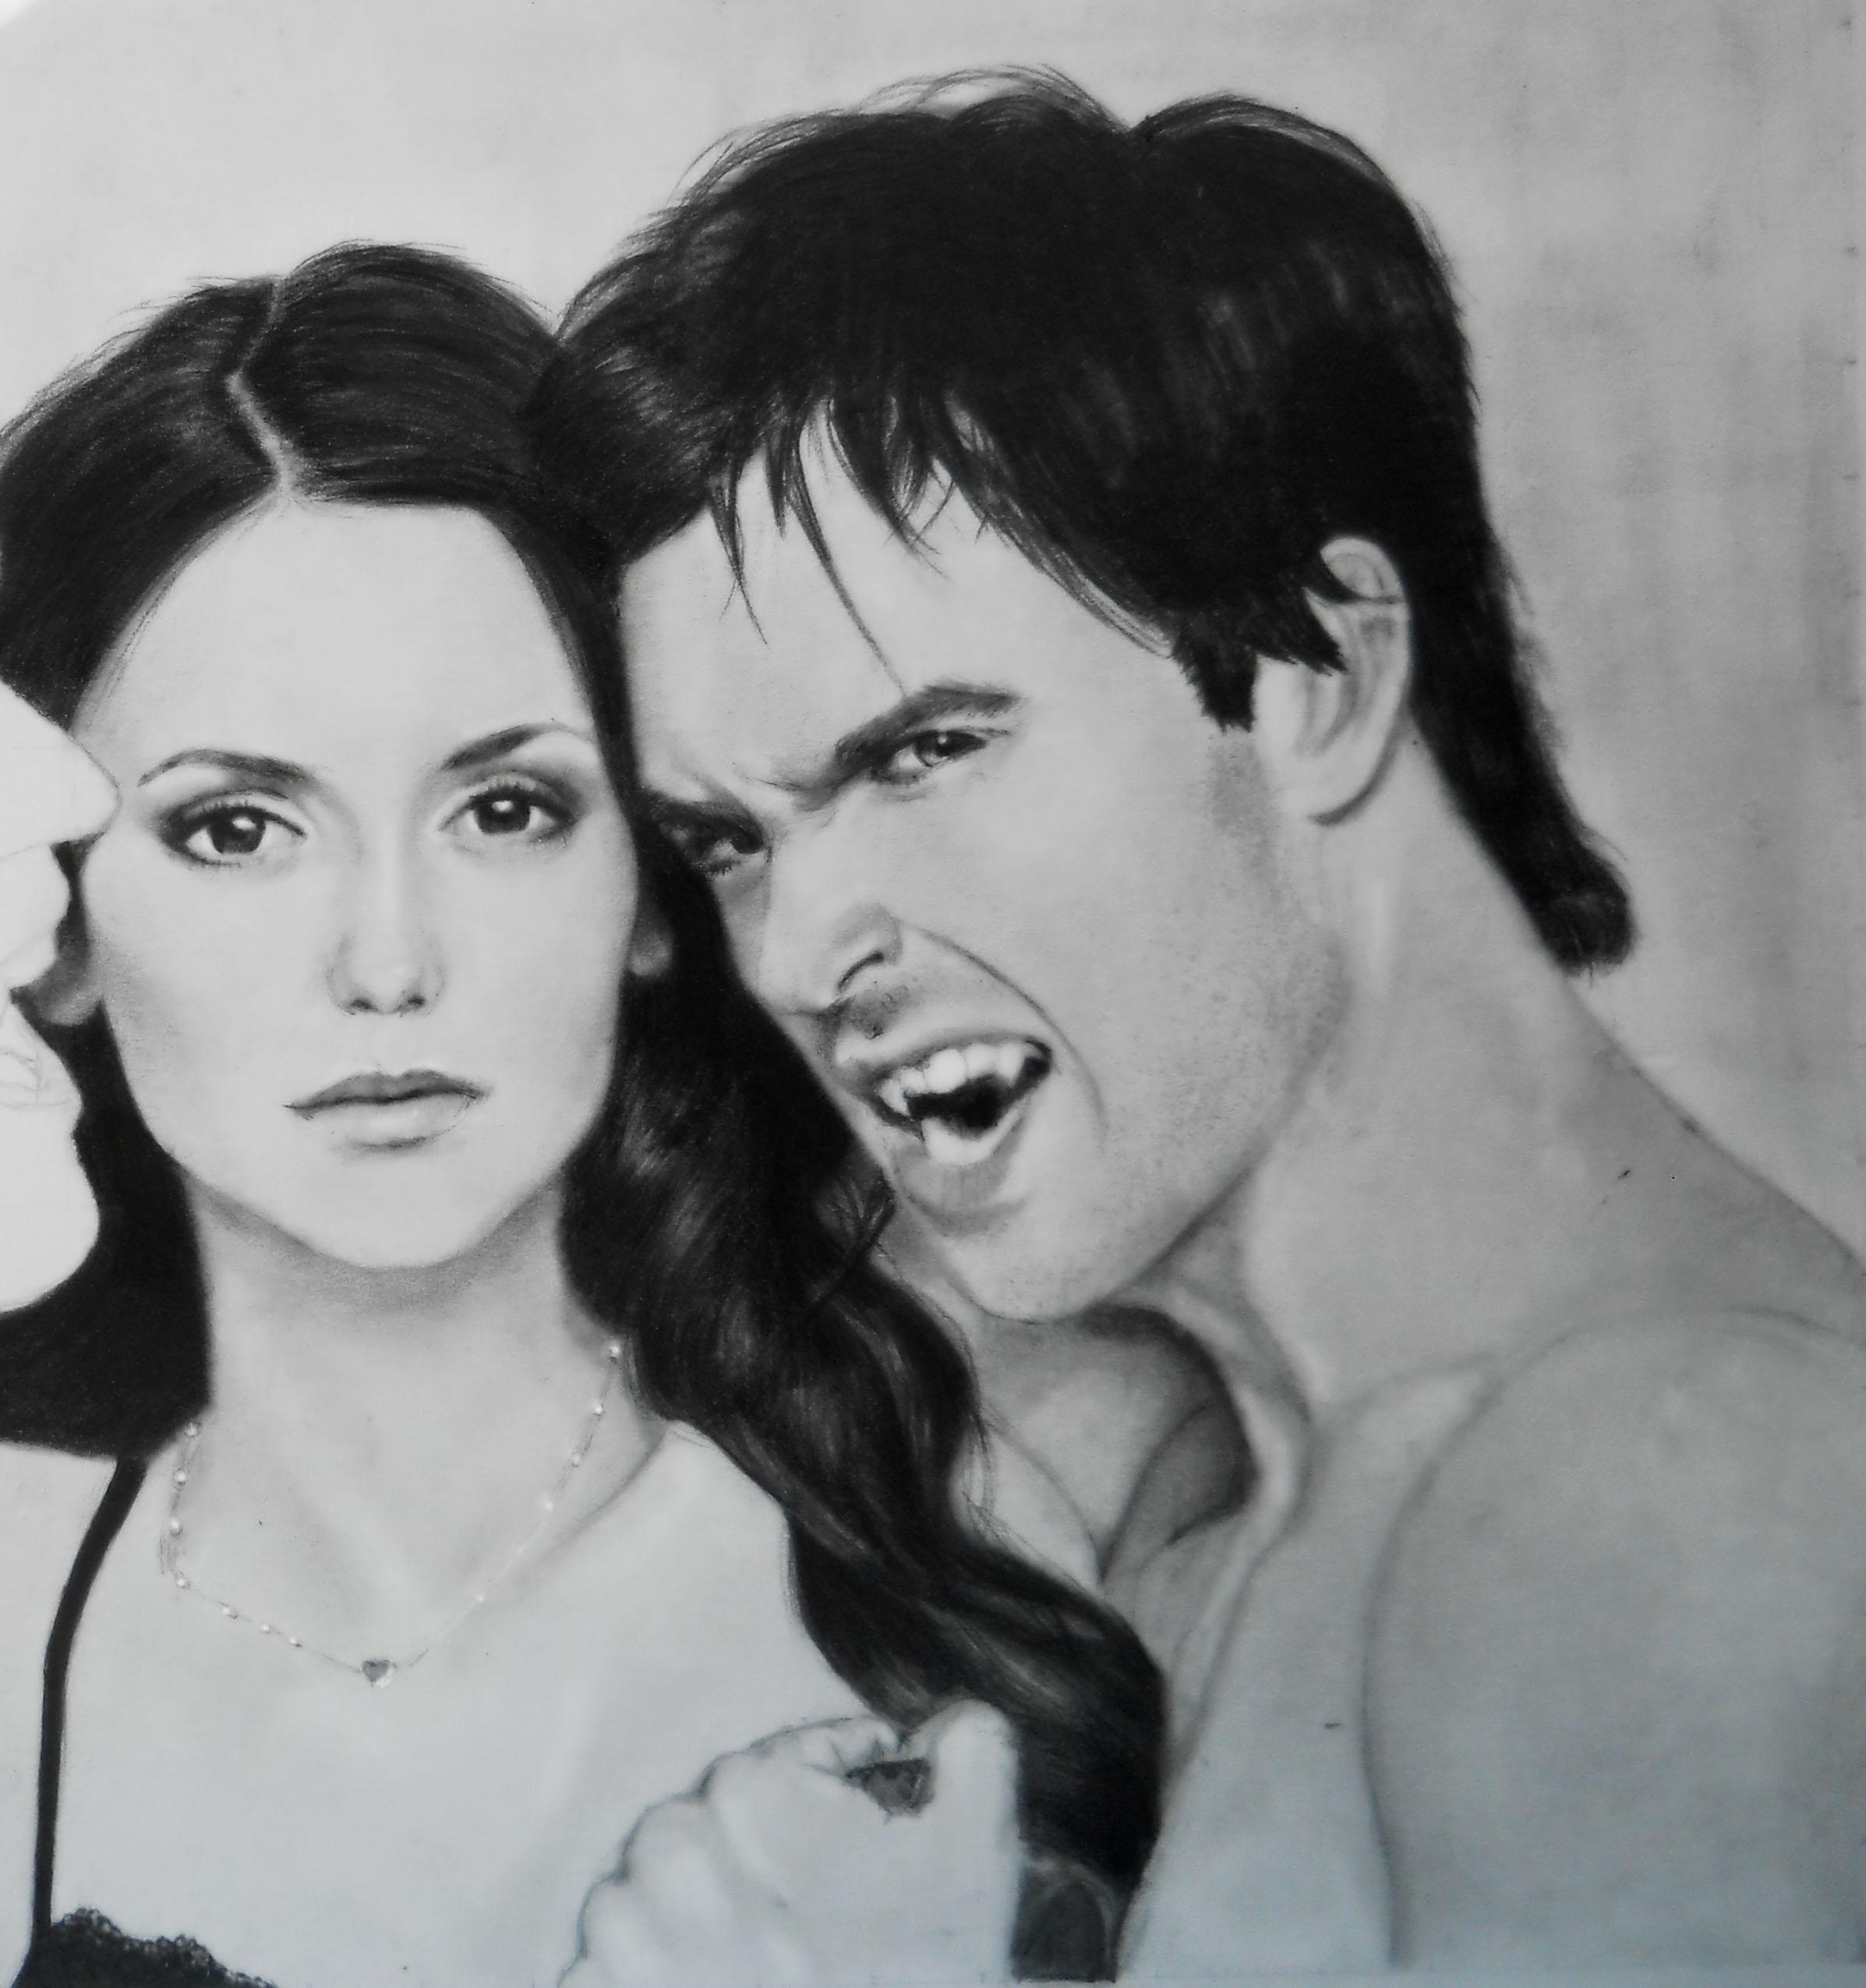 The Vampire Diaries Wip By Natlina On Deviantart